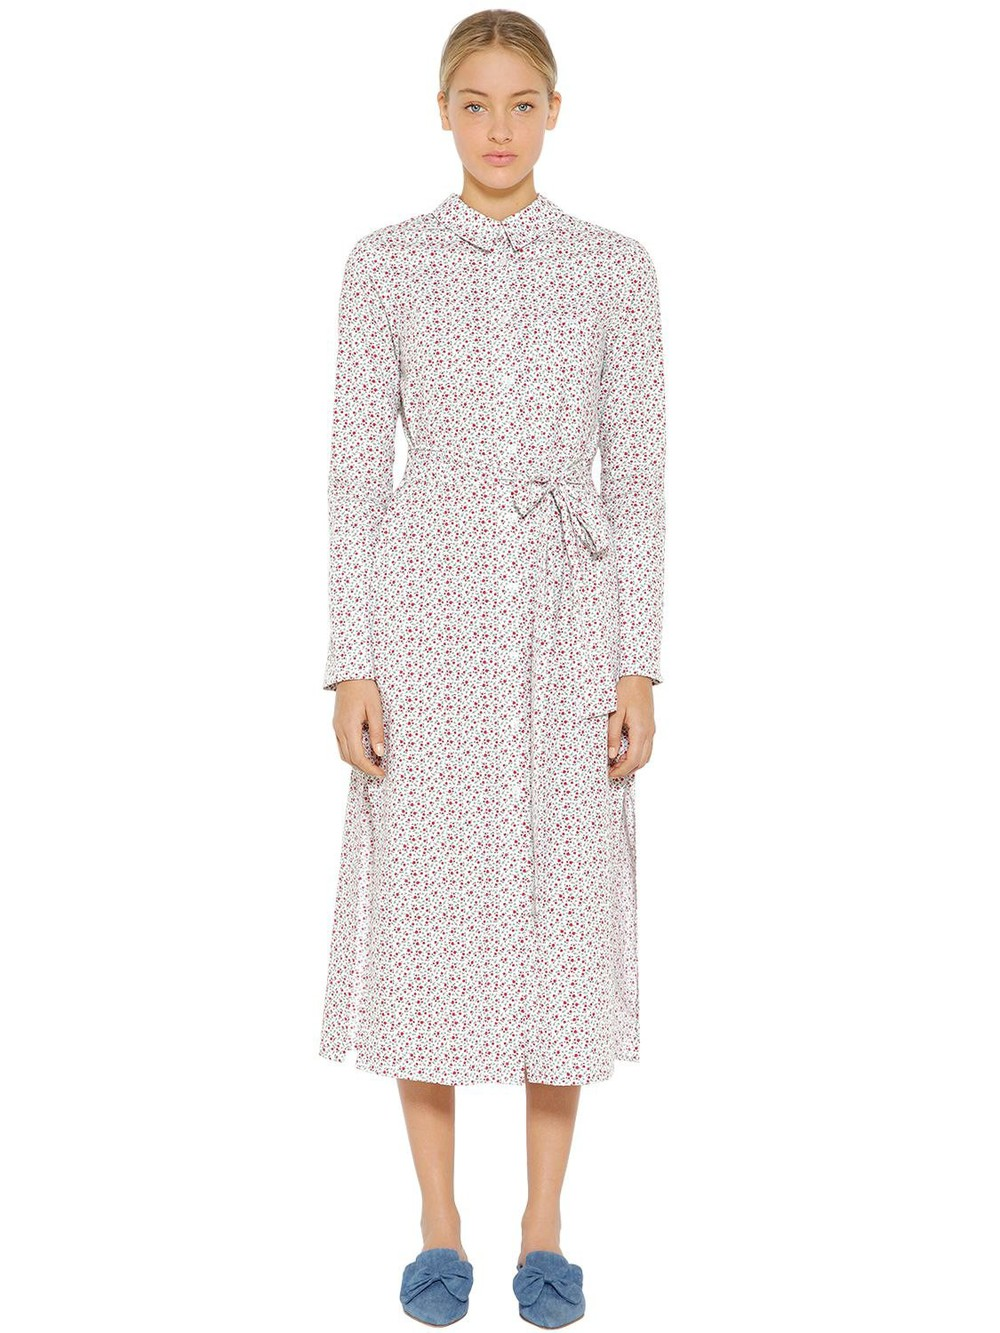 VIVETTA Floral Printed Cotton Poplin Shirt Dress in ivory